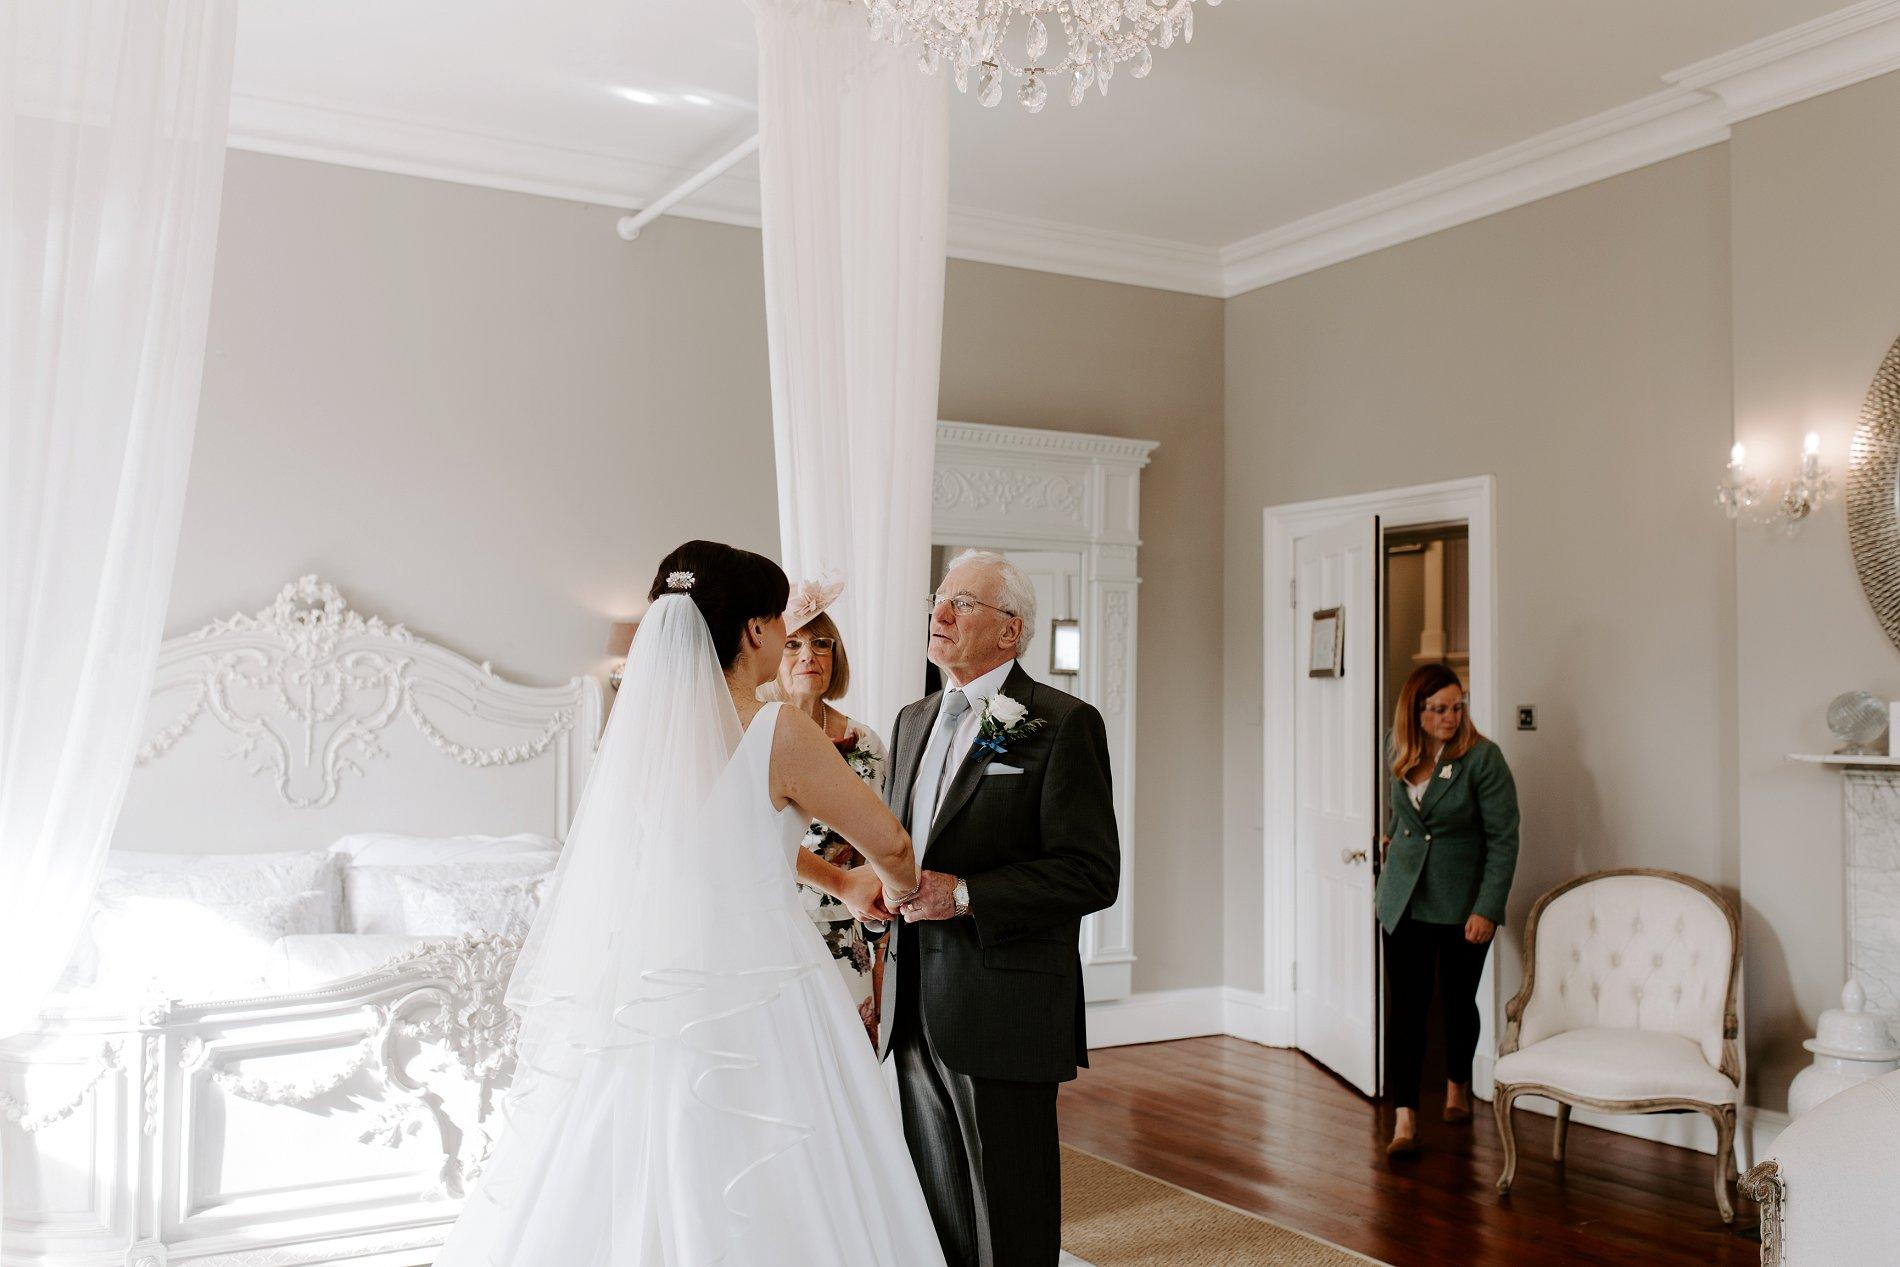 An Elegant White Wedding at Thicket Priory (c) Carla Whittingham Photography (28)